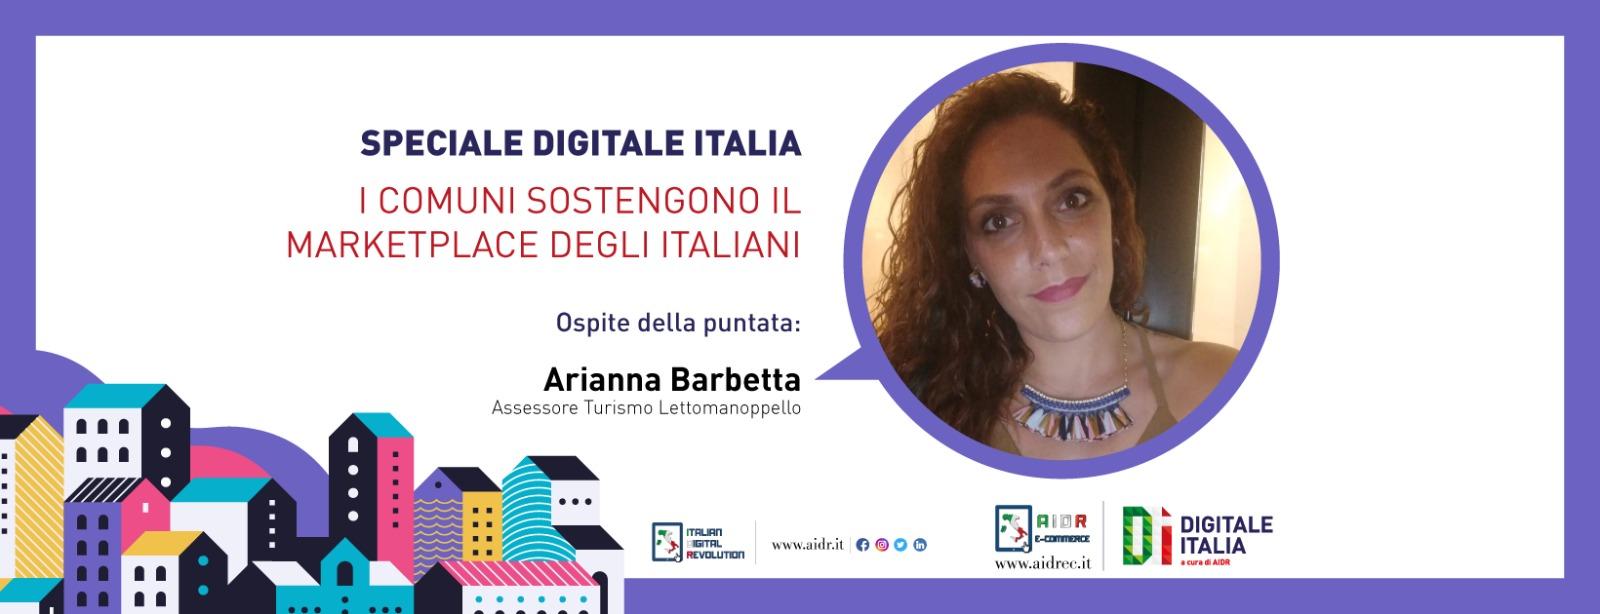 digitale-italia-2